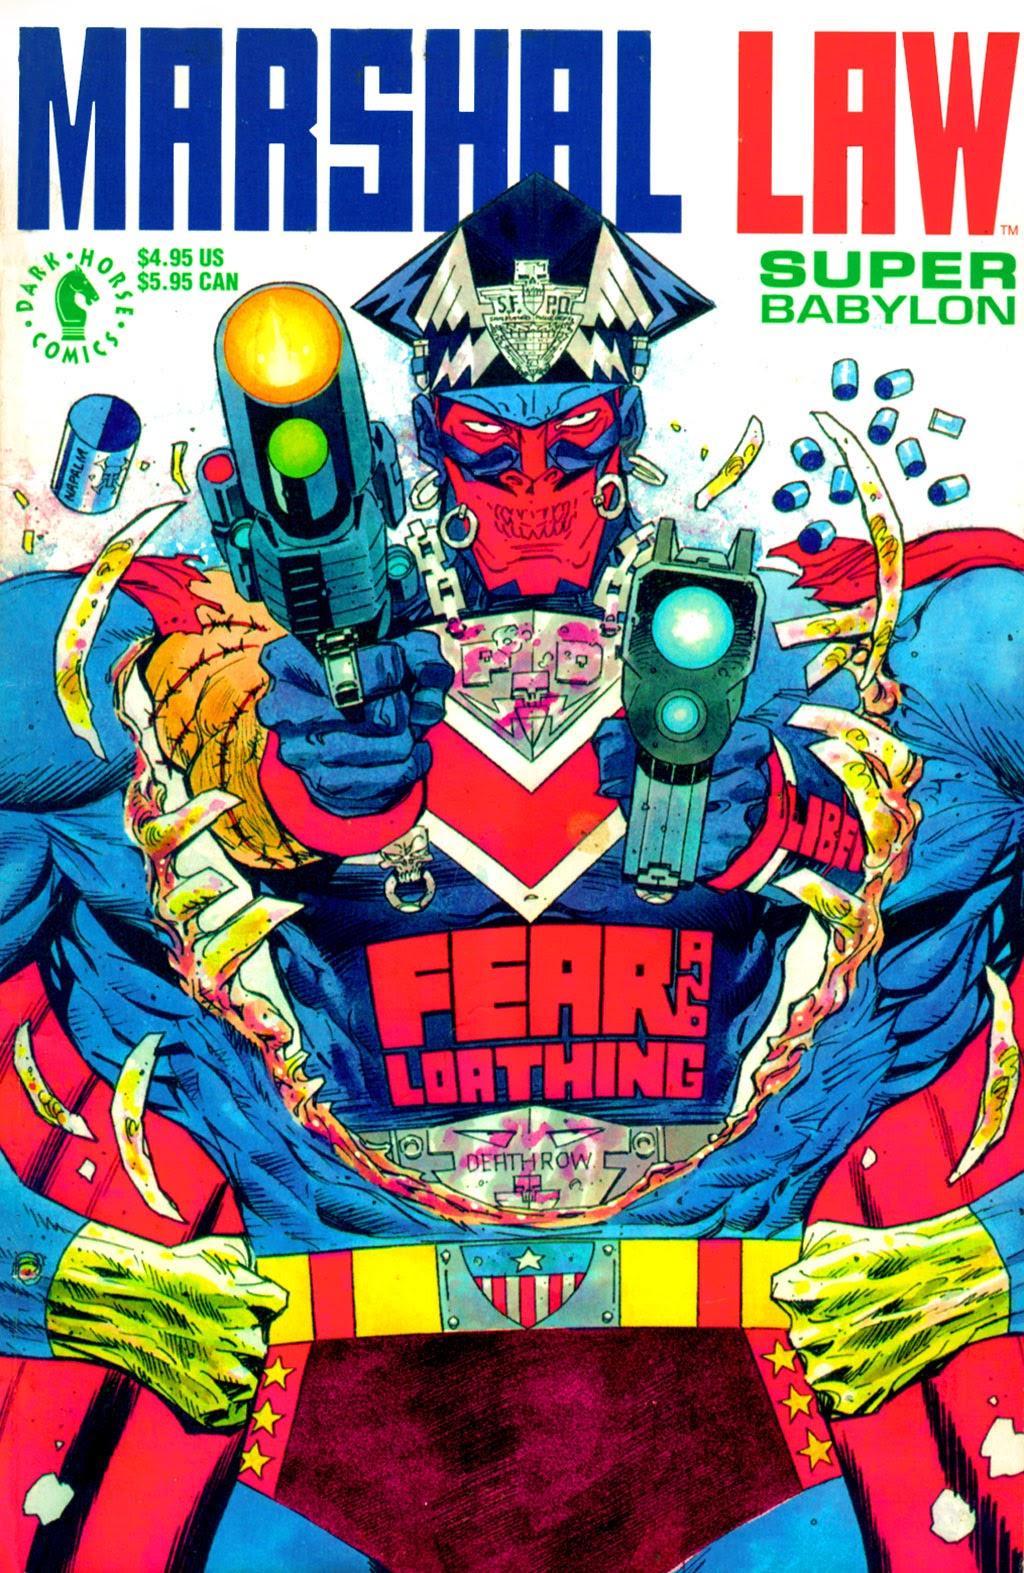 Marshal Law: Super Babylon Full Page 1